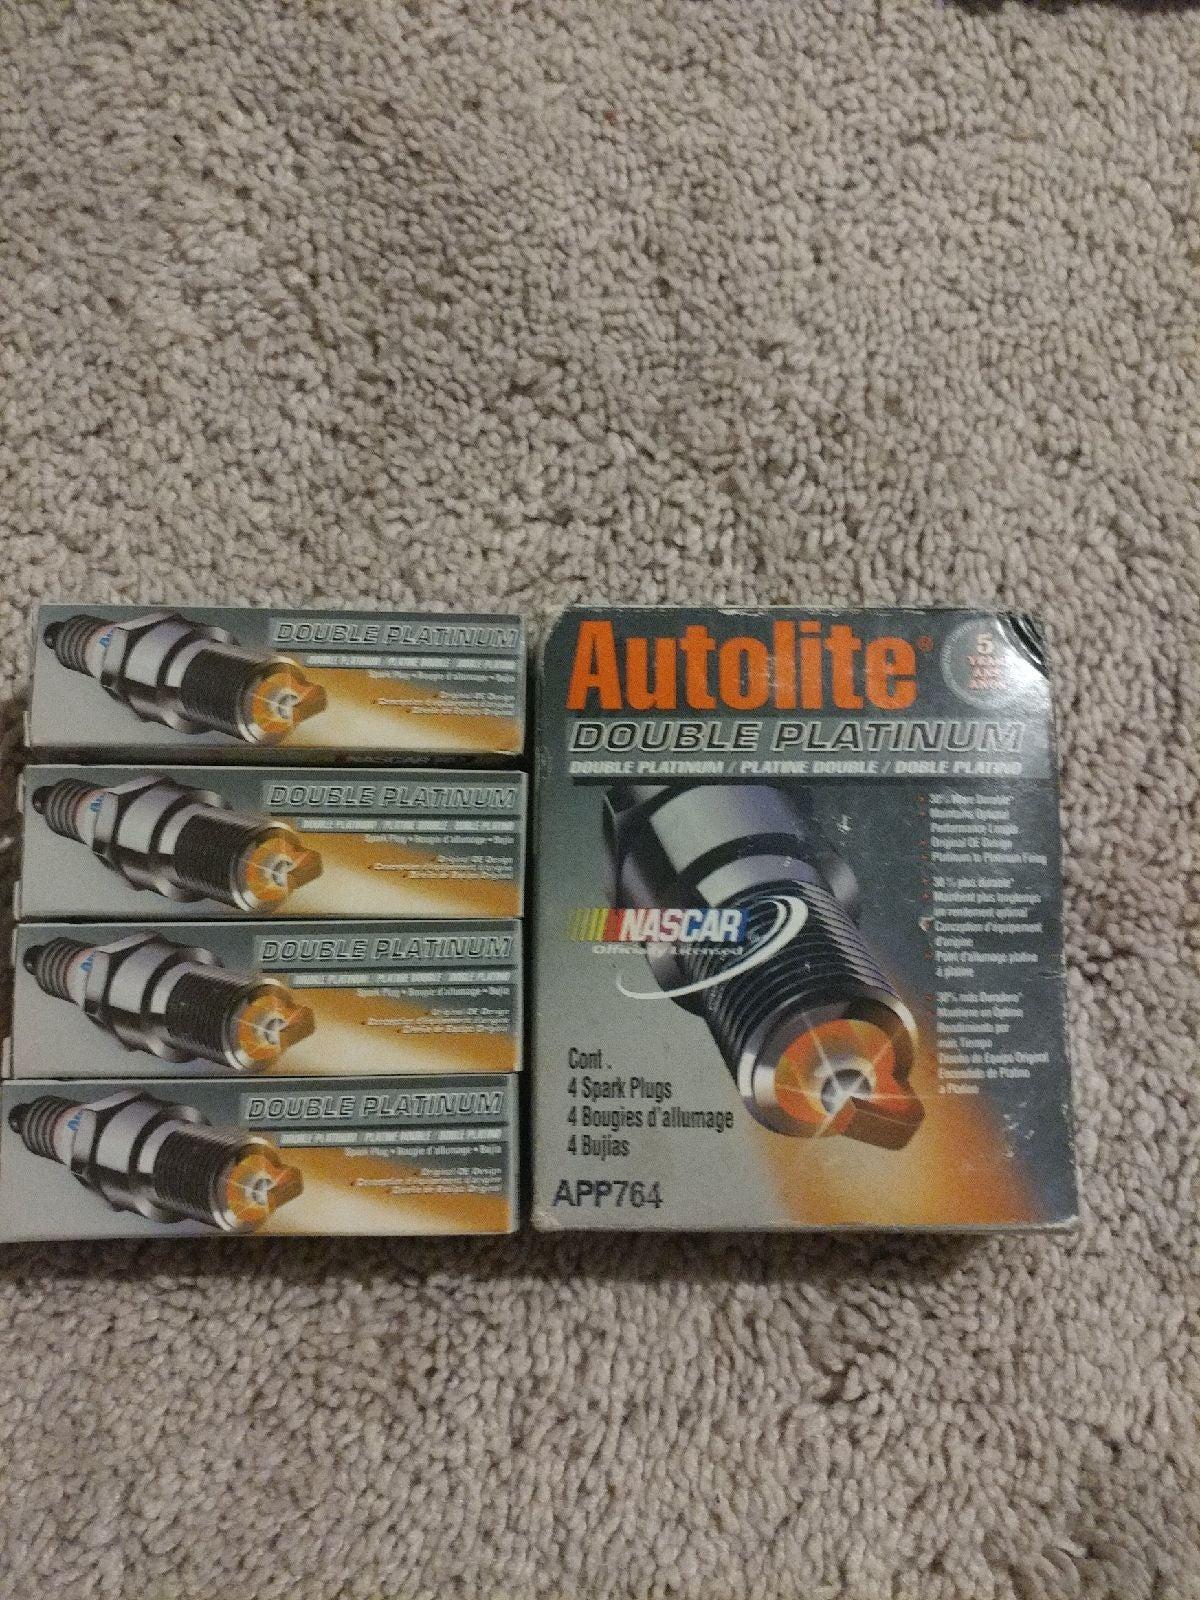 Autolite Double Platinum Spark Plugs X4